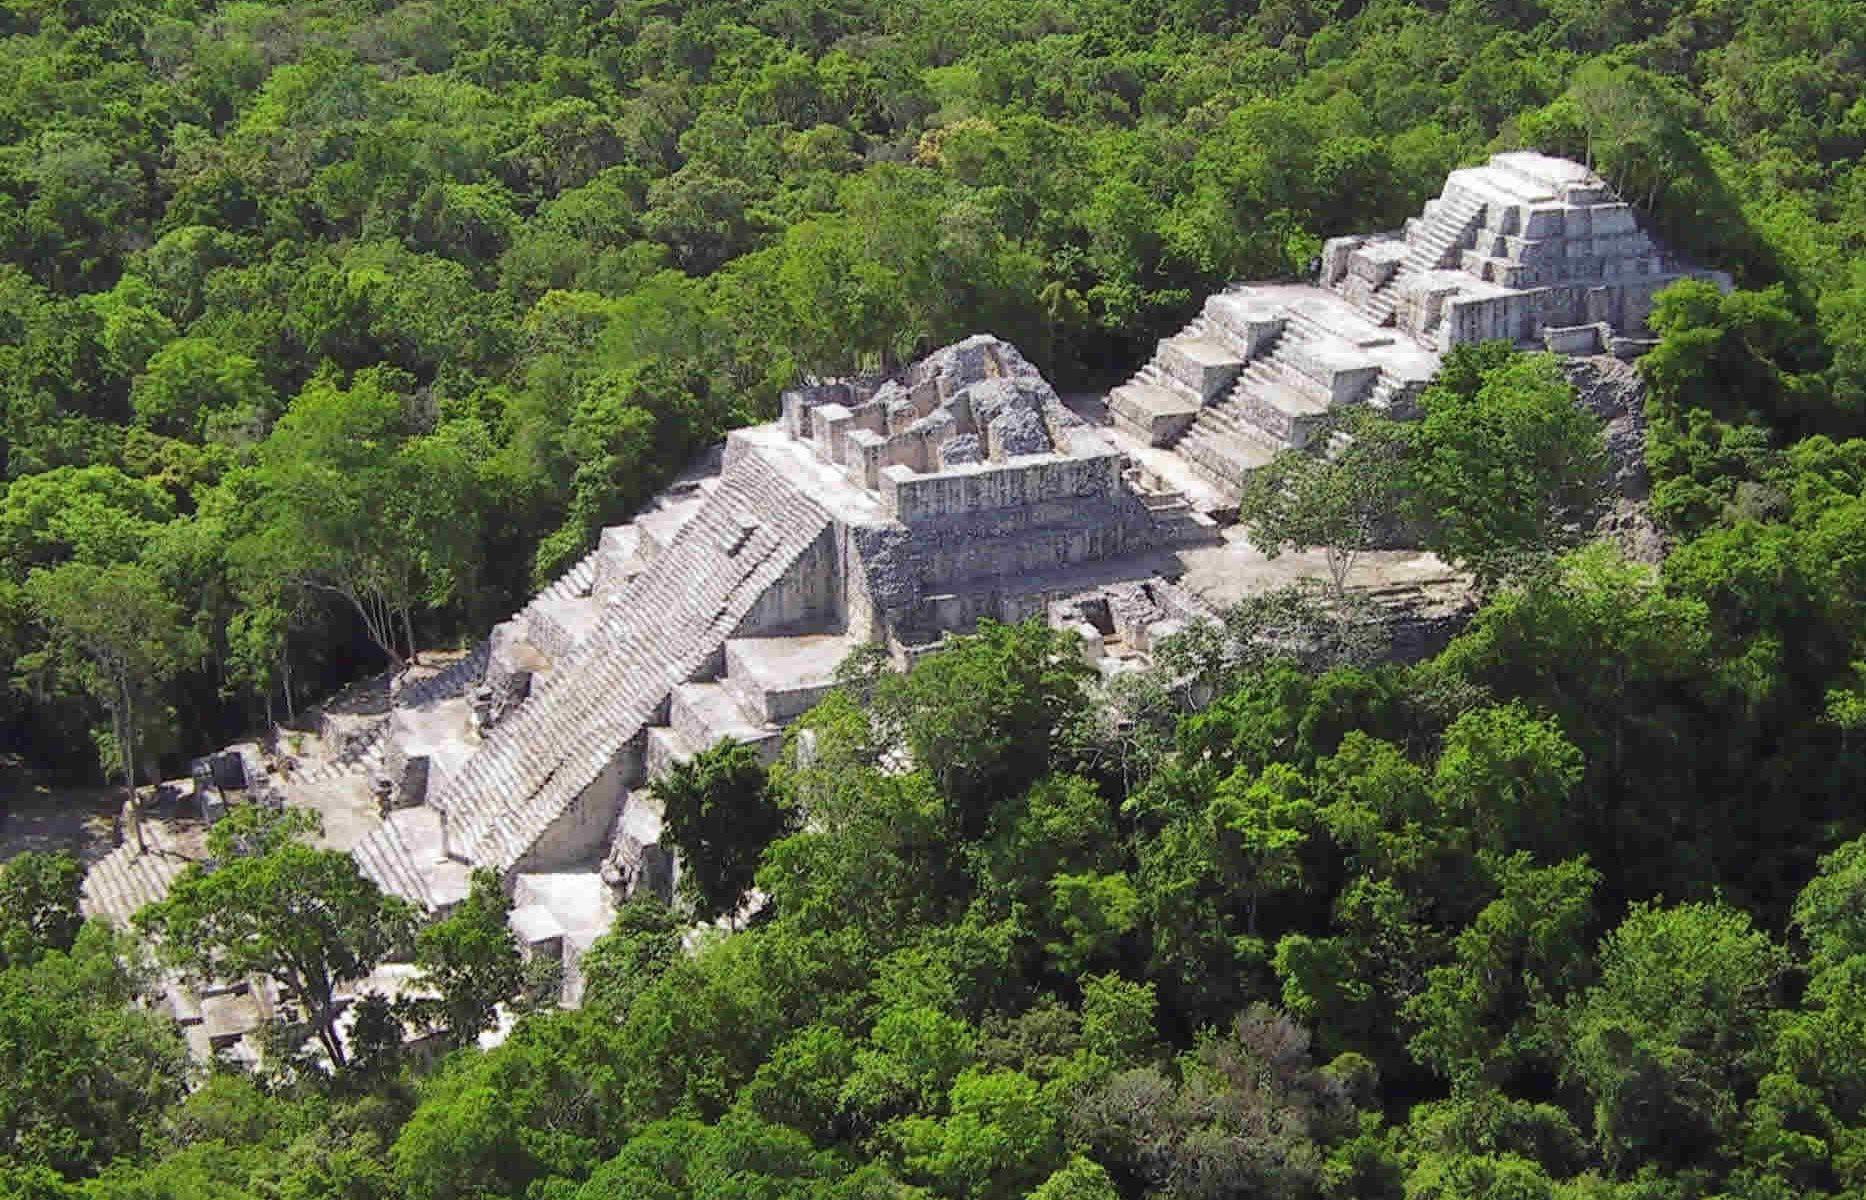 Hotel Rio Bec Dreams near Calakmul | Structure II Calakimul Rio Bec Dreams